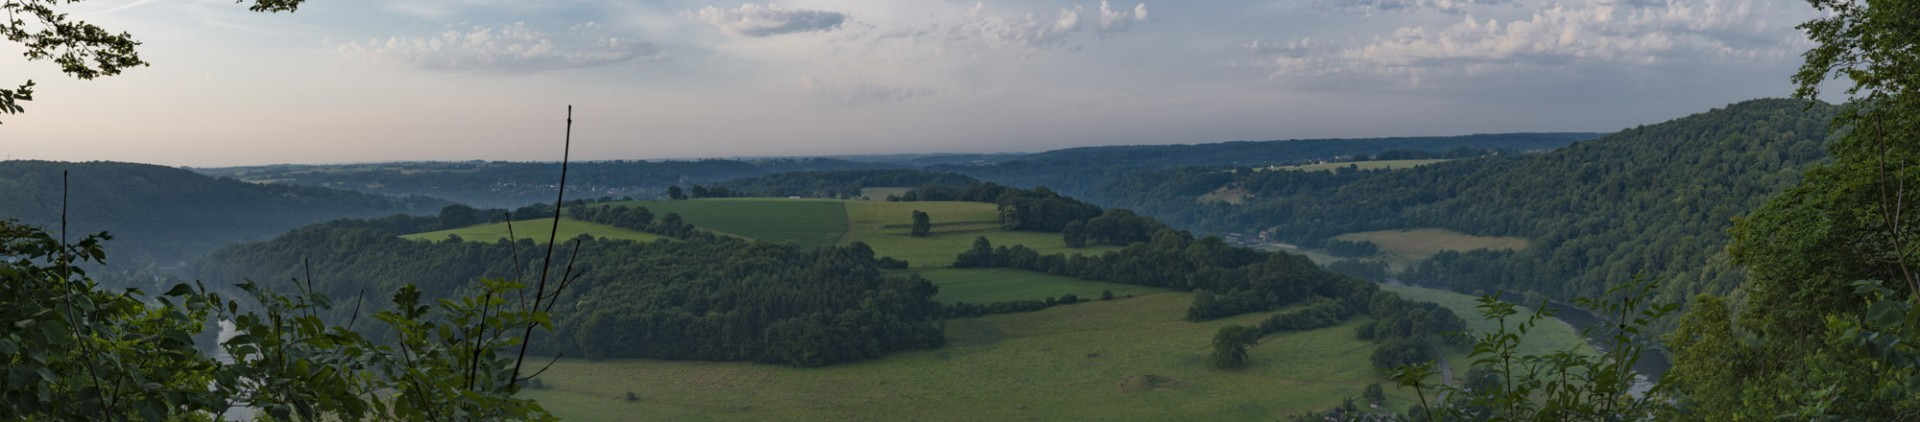 5 panorama ideas - Liège province